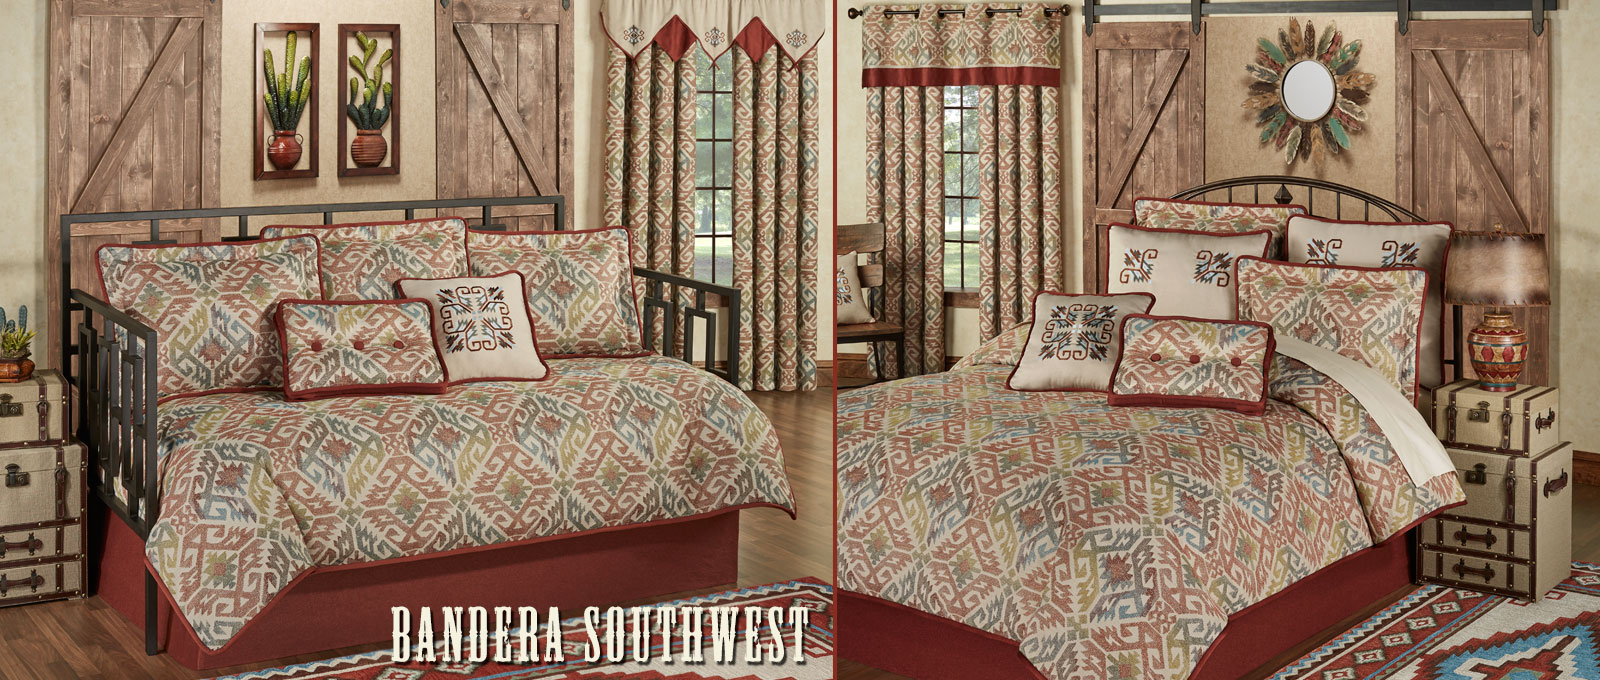 Bandera Southwest Bedroom